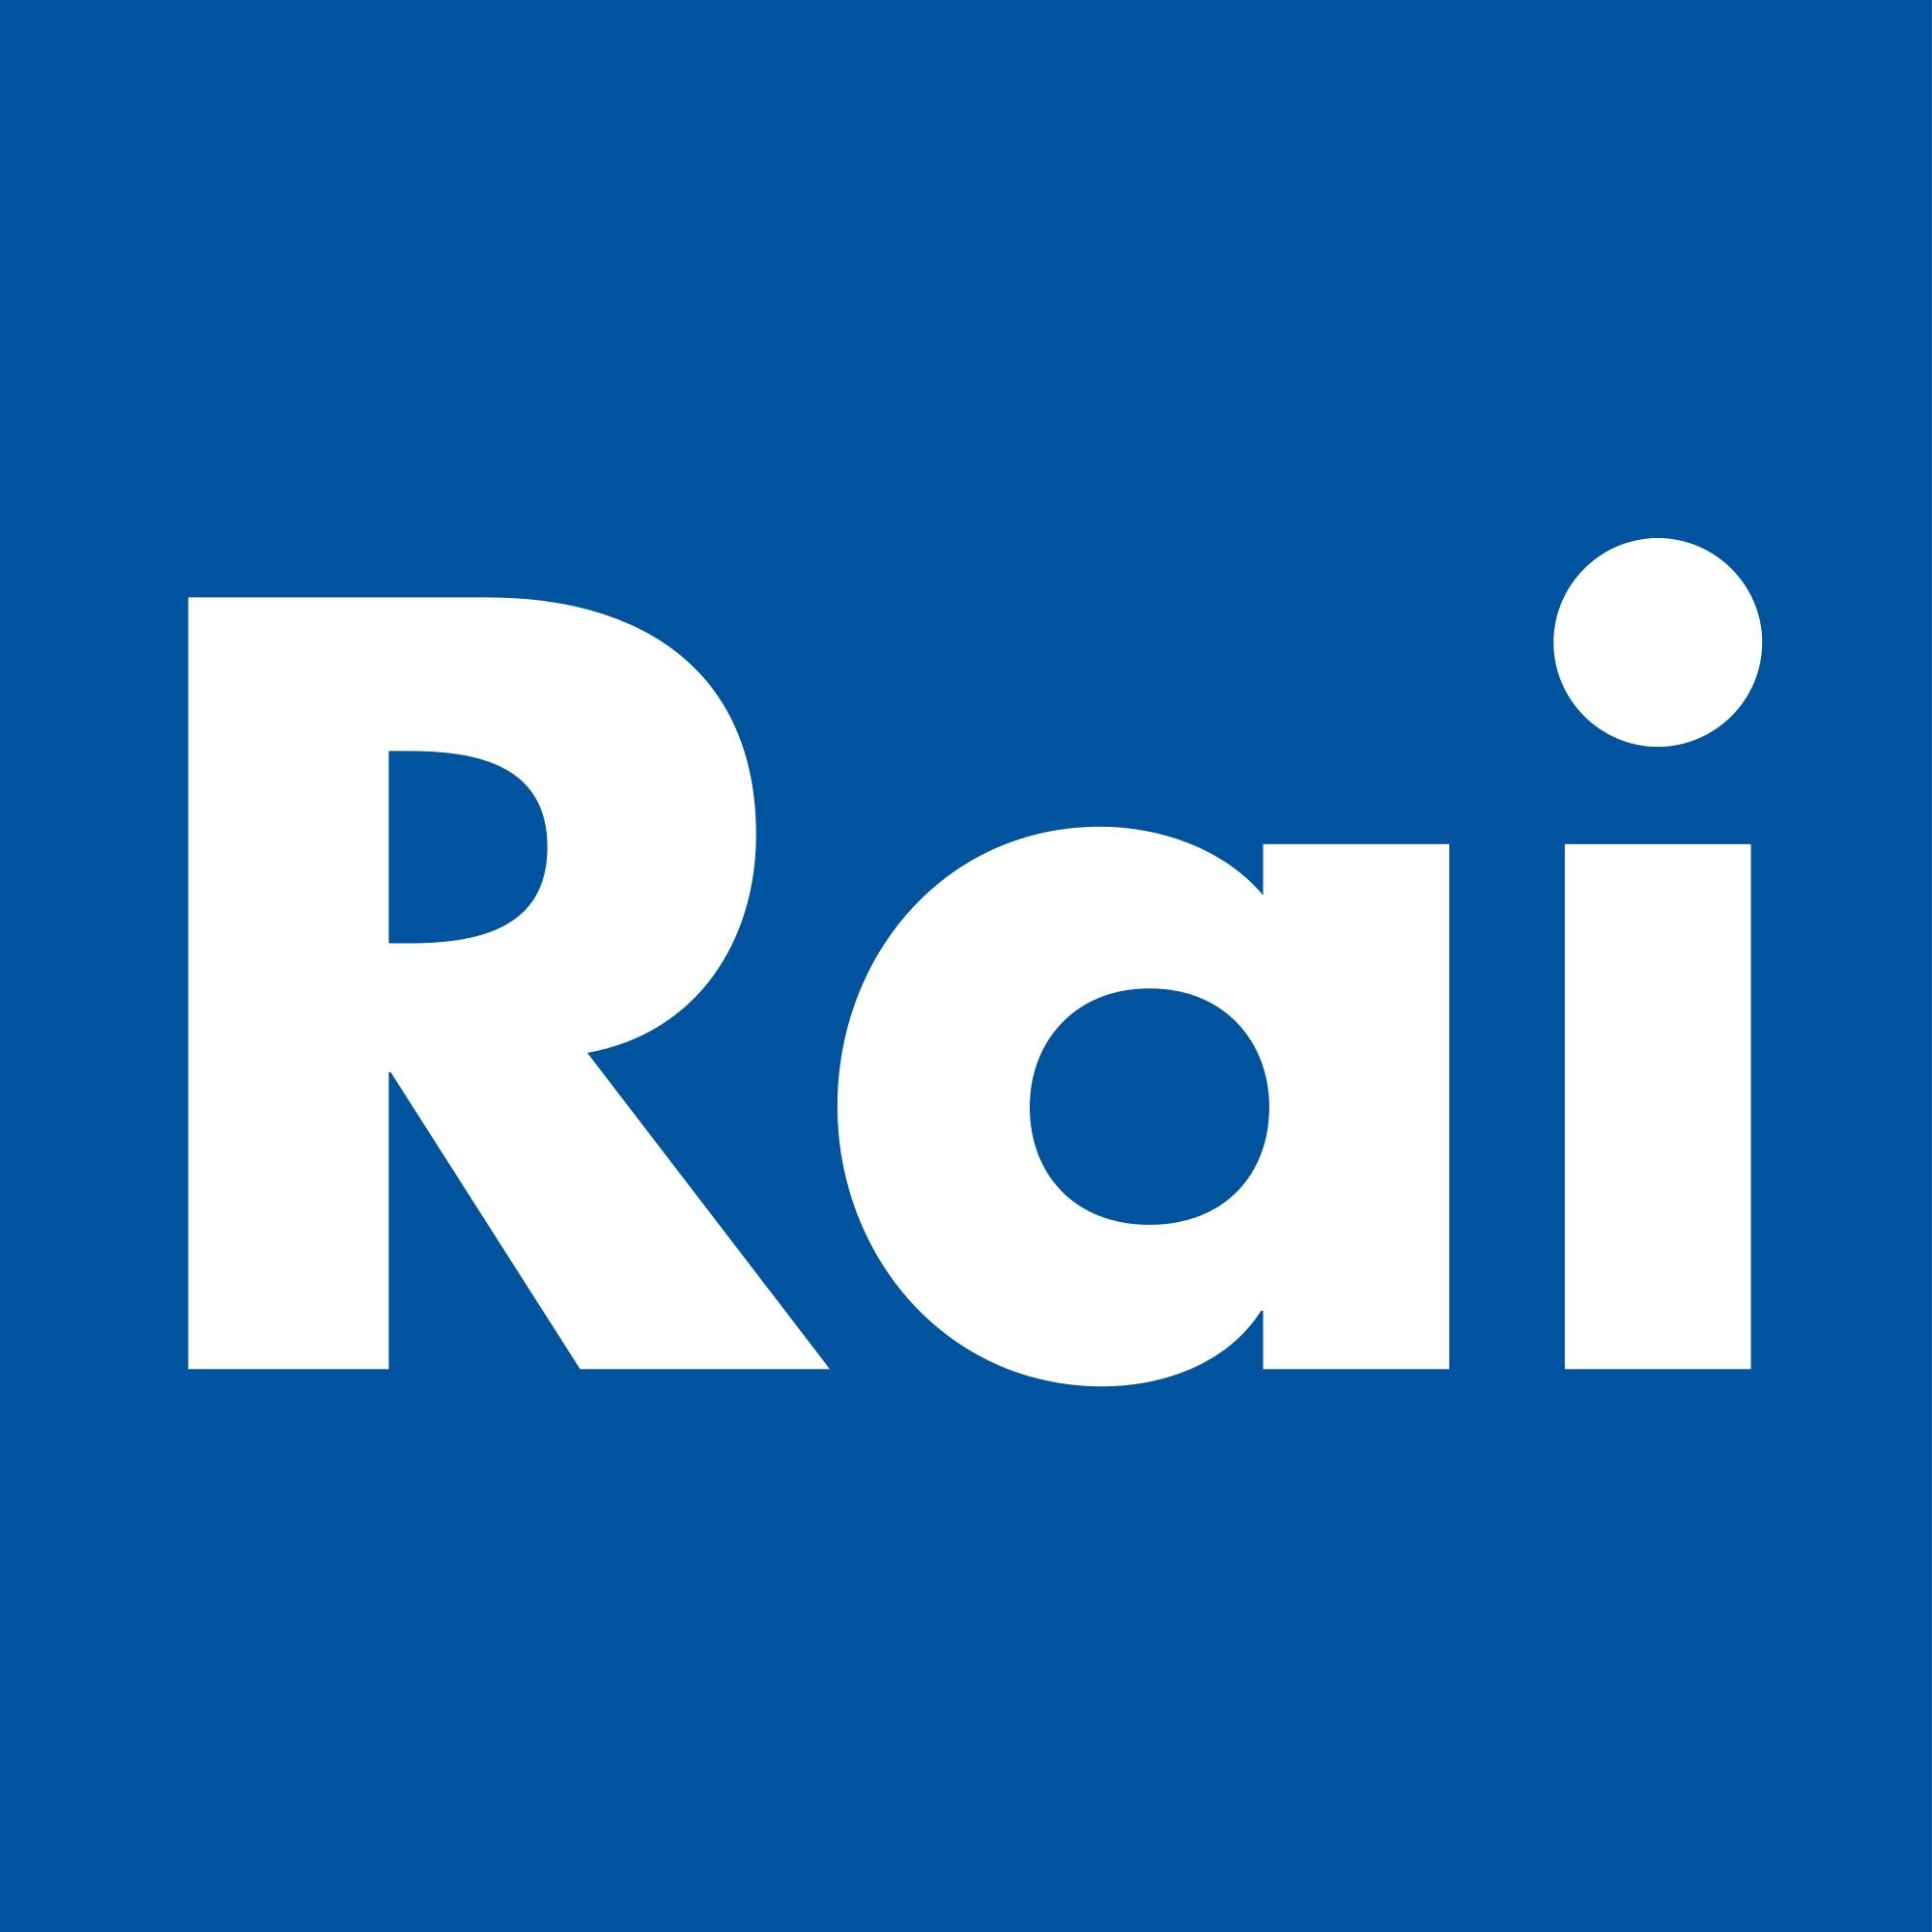 rai_e28094_radiotelevisione_italiana_logo_svg